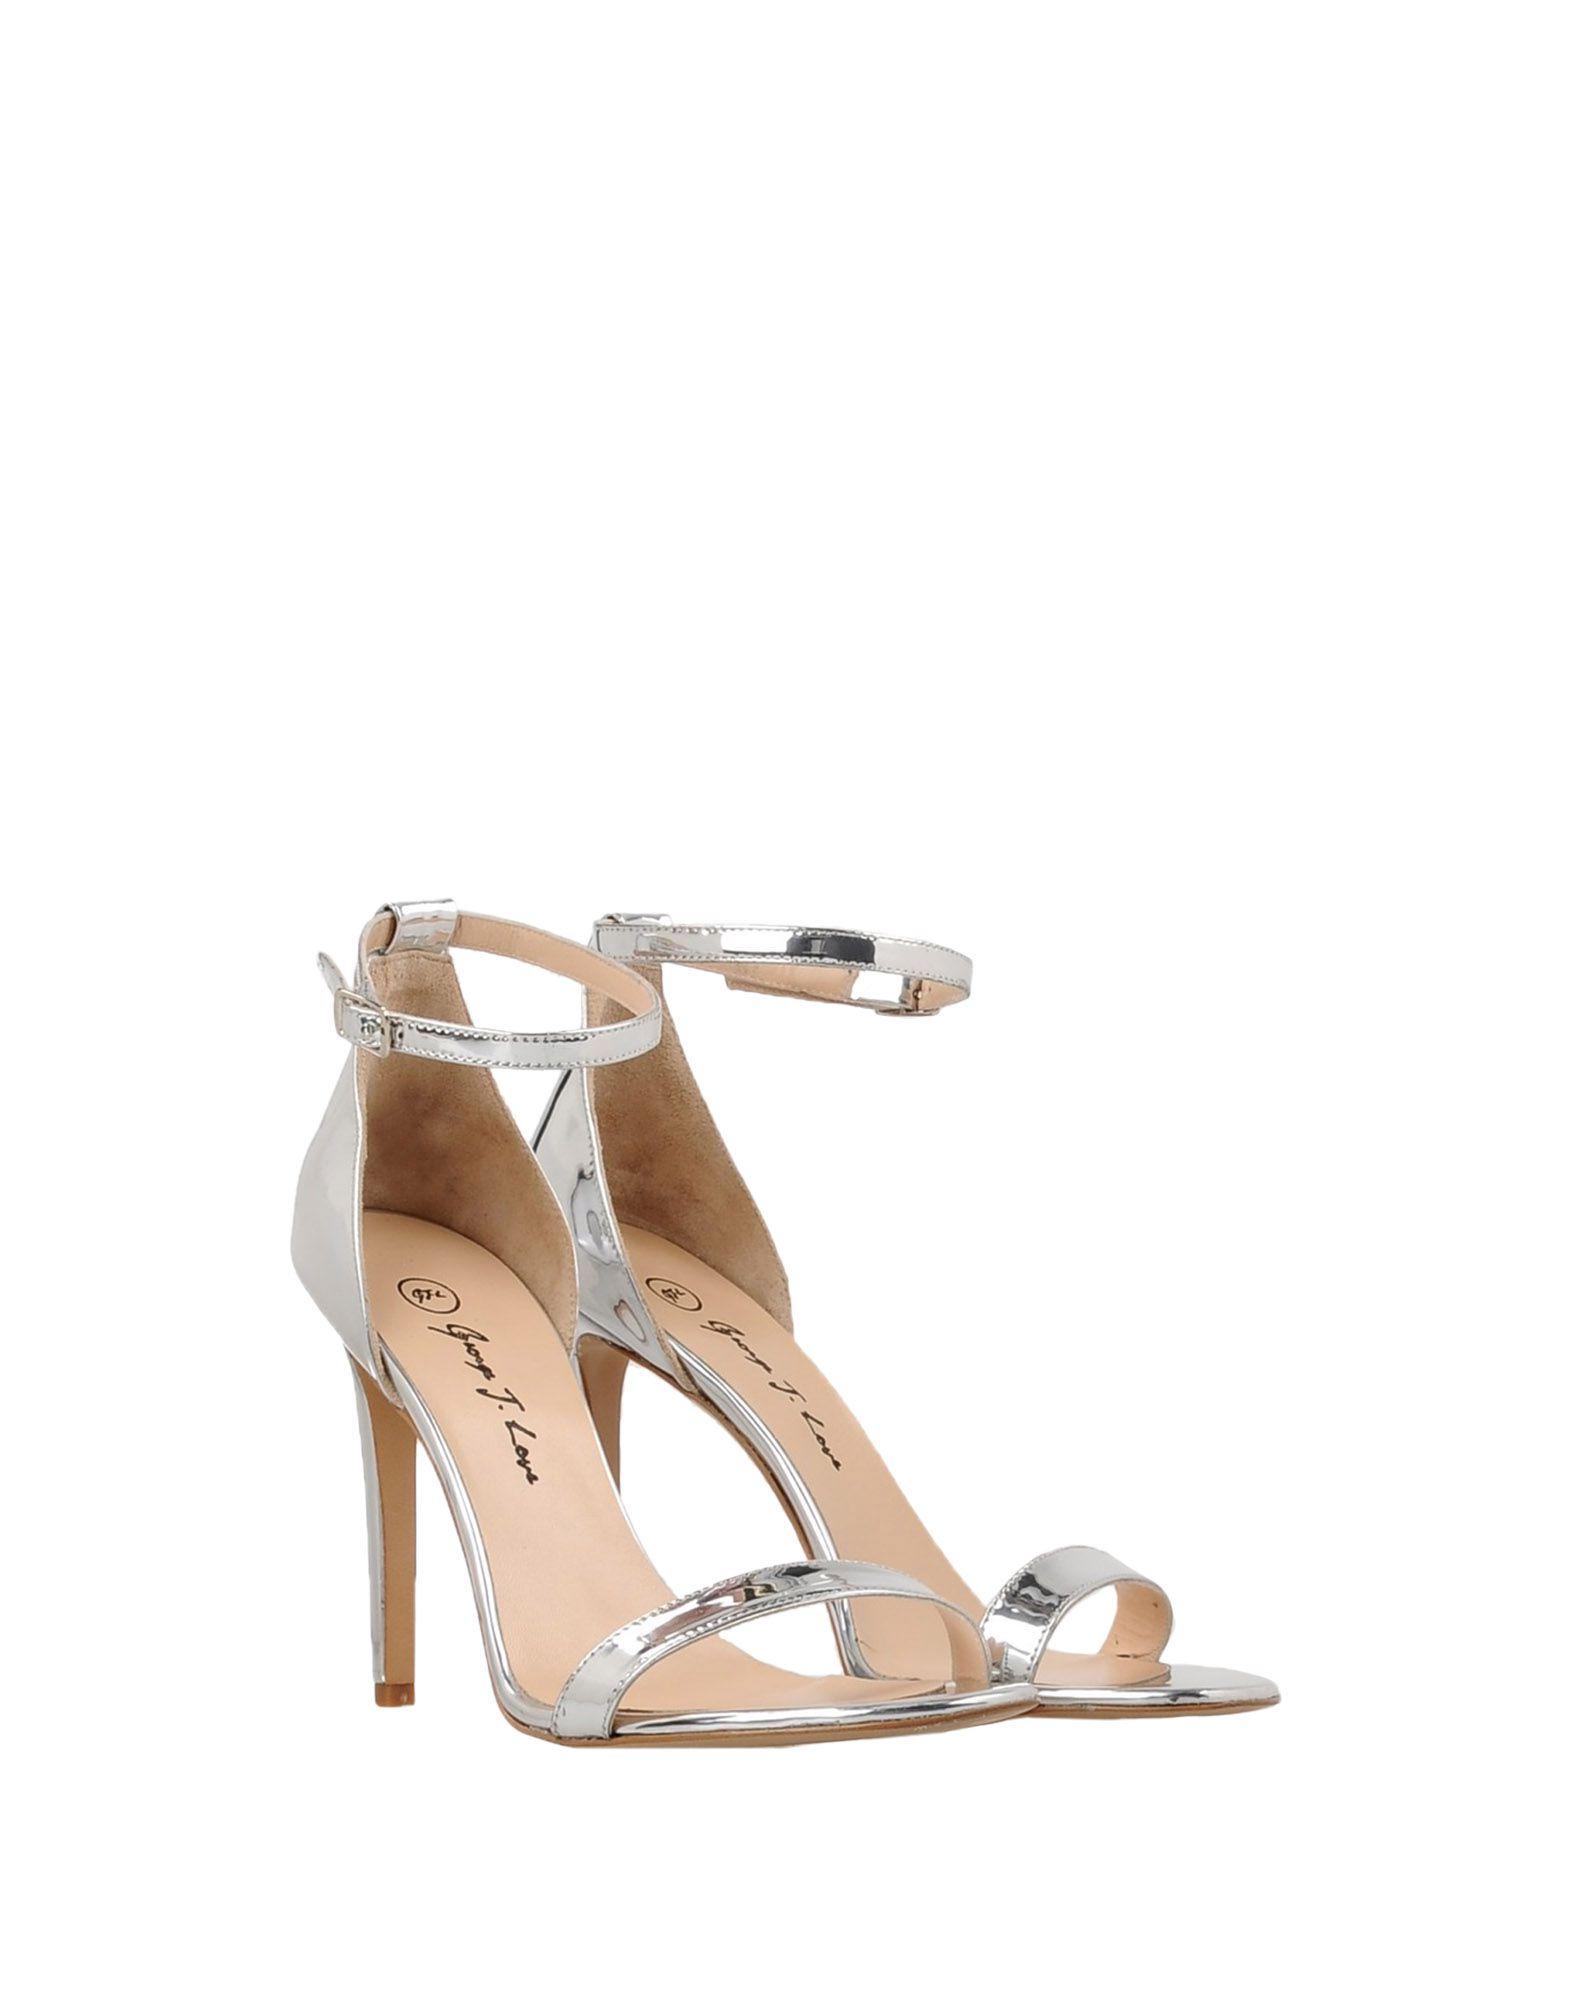 George J. 11428275IH Love Sandalen Damen  11428275IH J. Gute Qualität beliebte Schuhe fe3b22